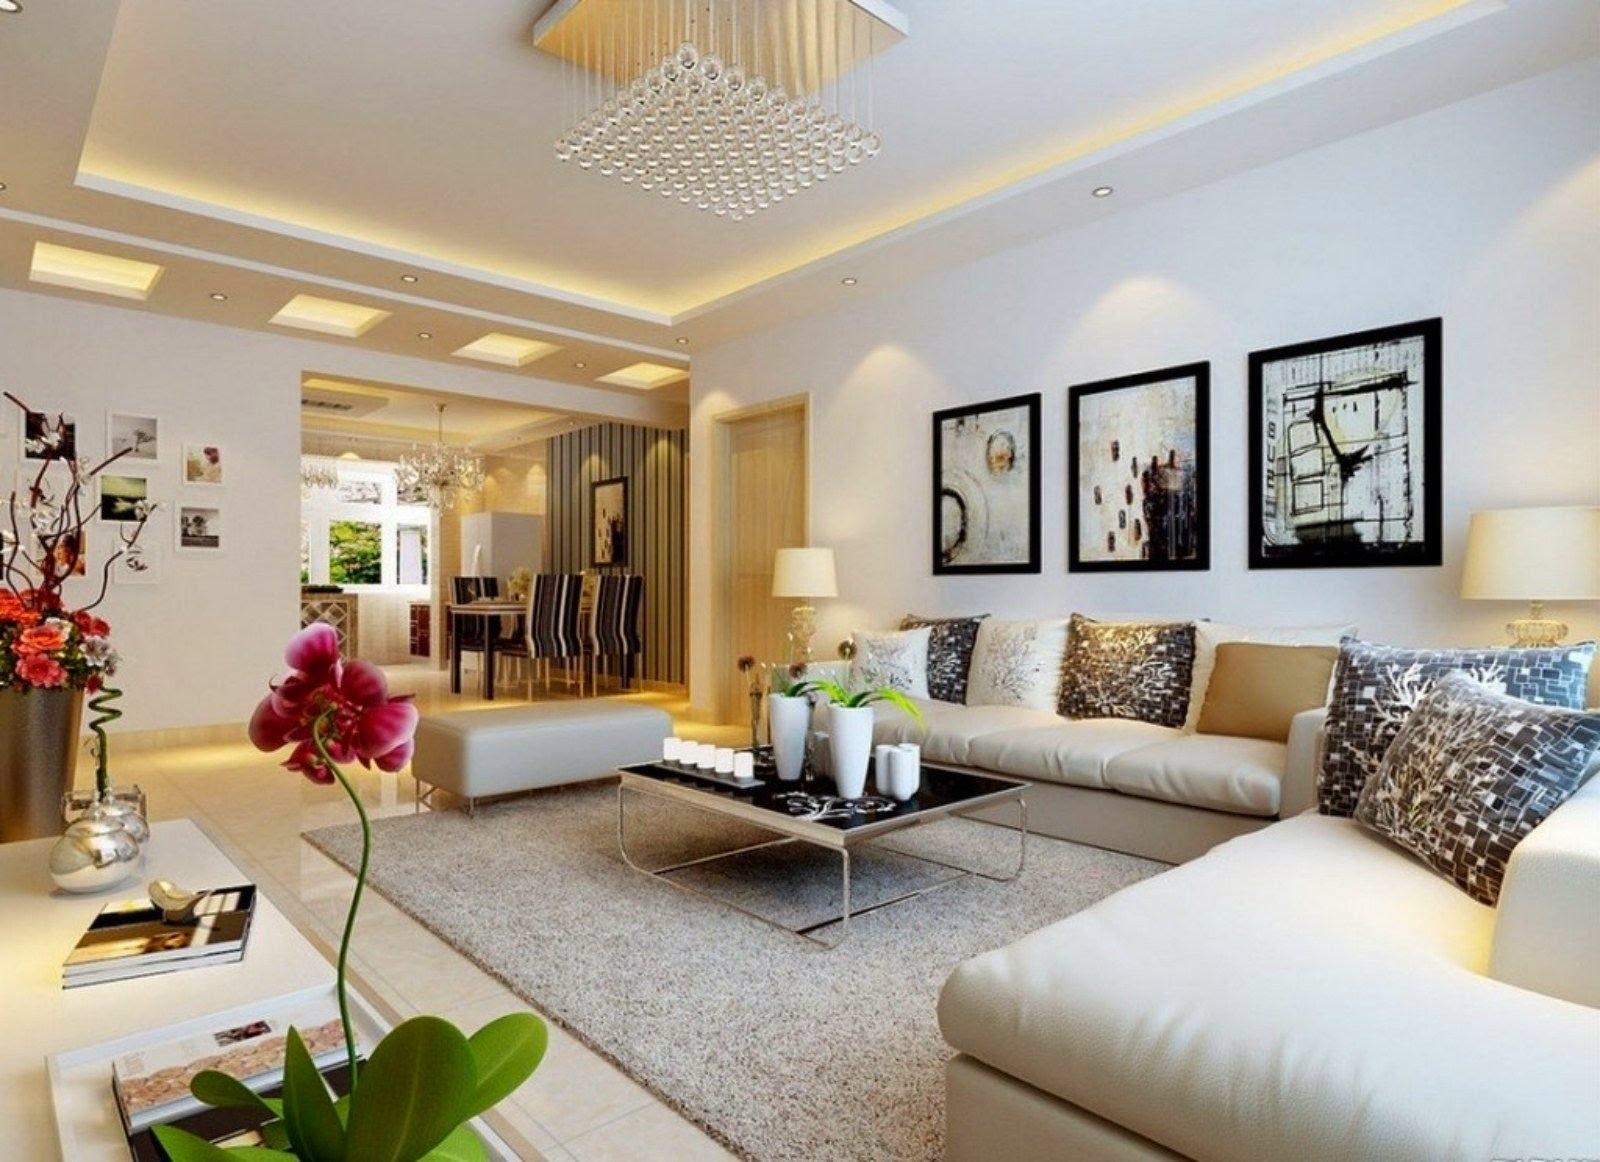 Home Design Ideas 2015 - HomeDIB